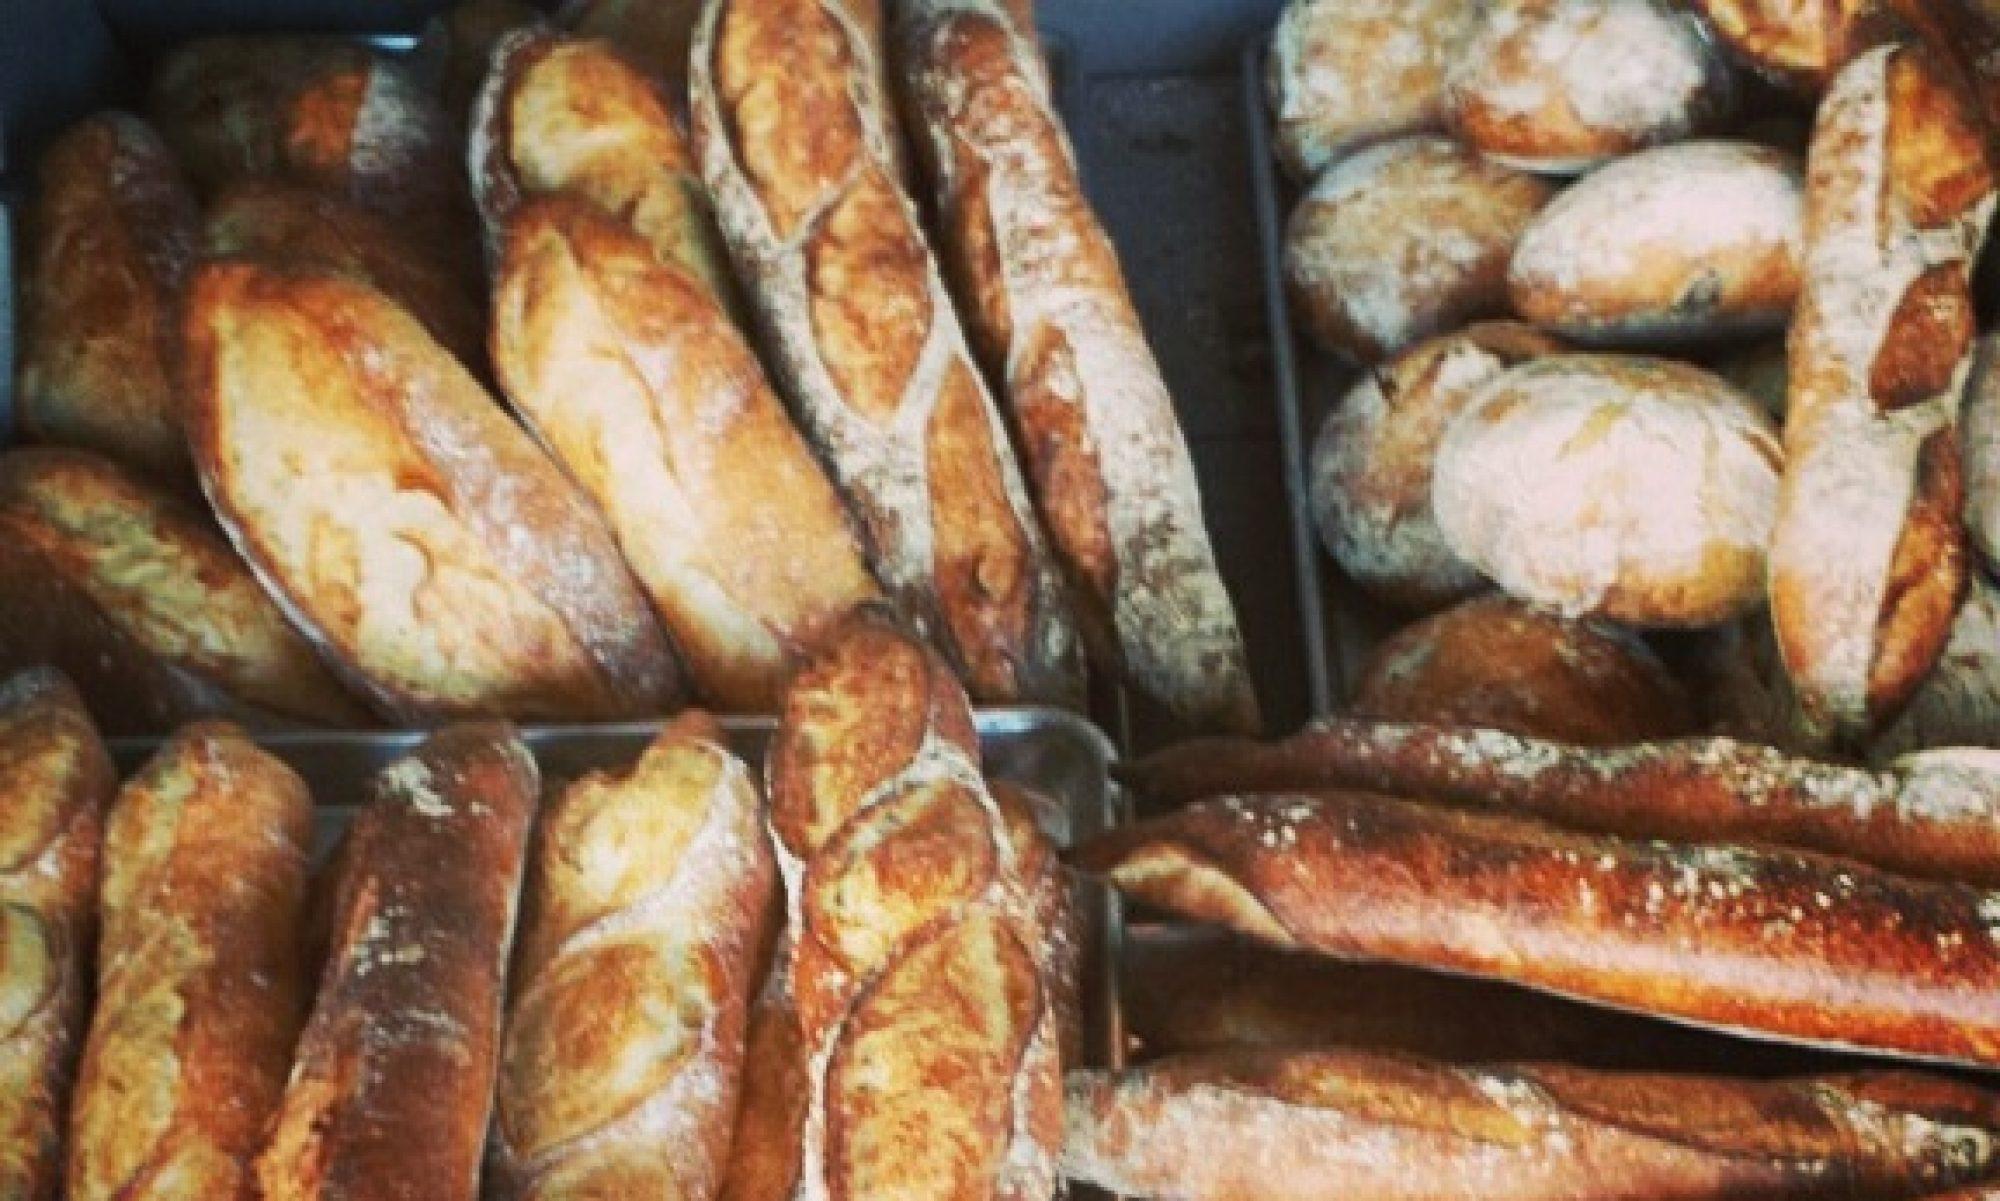 Birmingham Breadworks